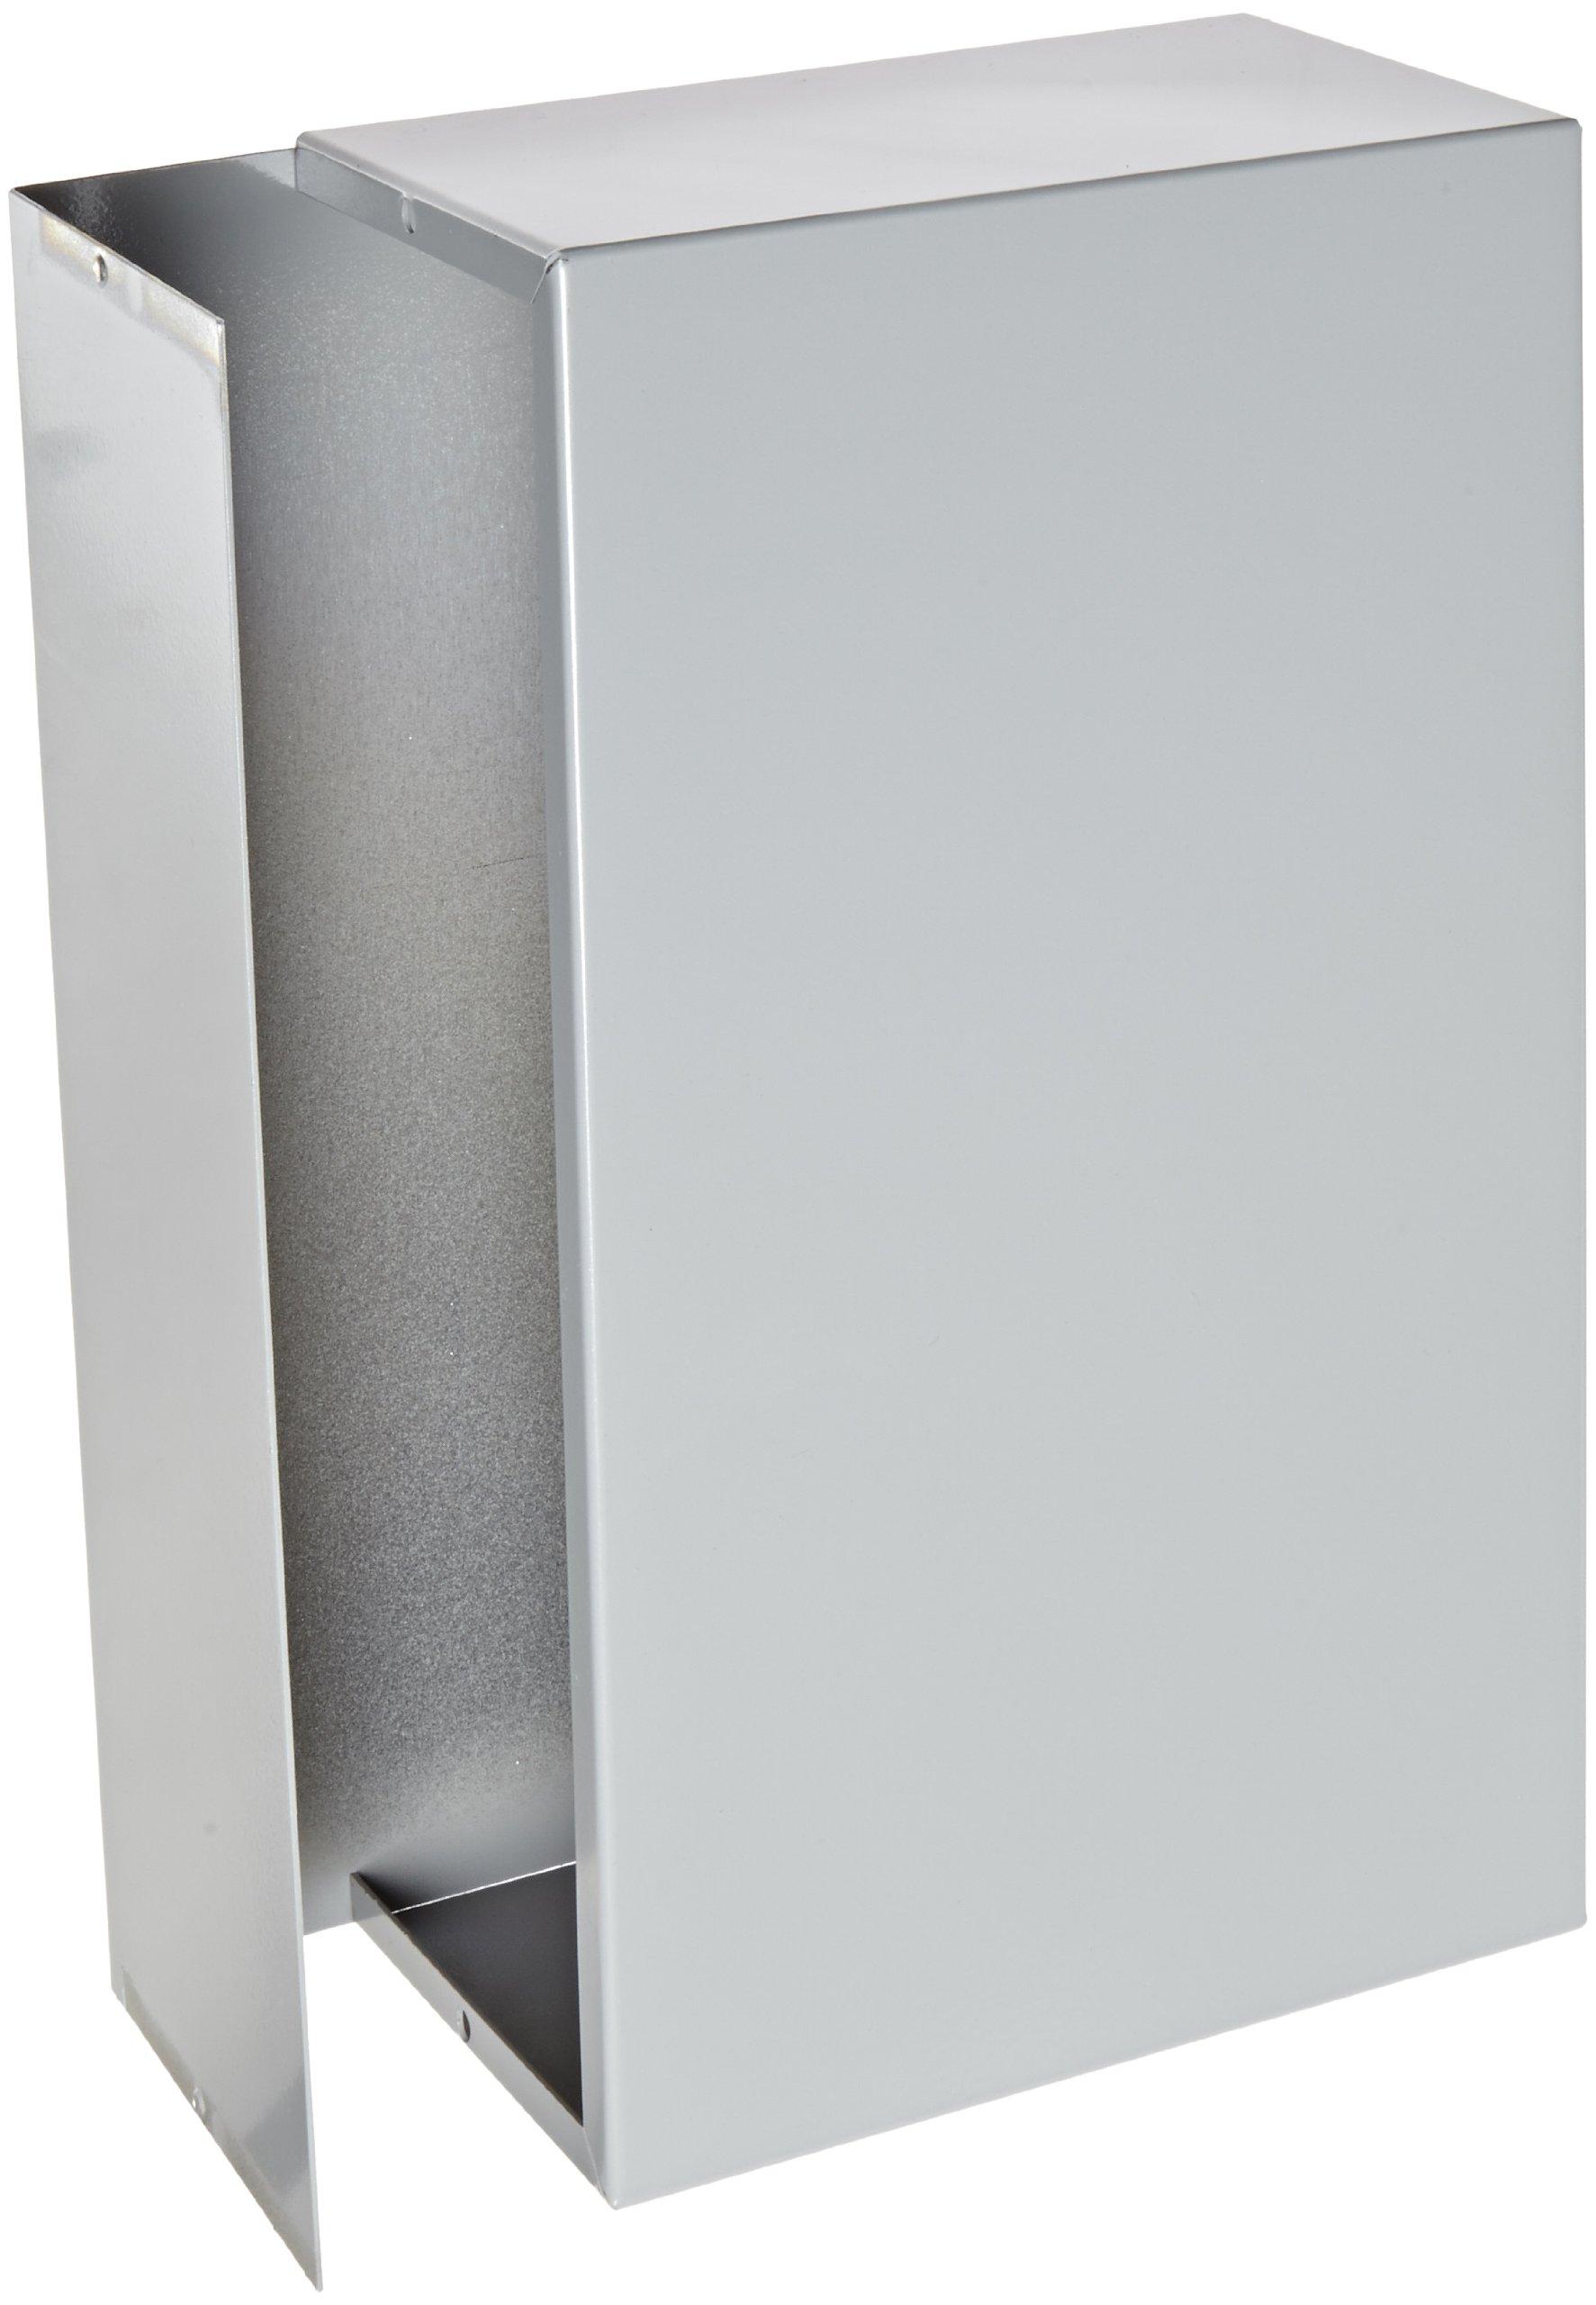 BUD Industries CU-2111-B Aluminum Electronics Minibox, 12'' Length x 7'' Width x 4'' Height, Smooth Gray Finish